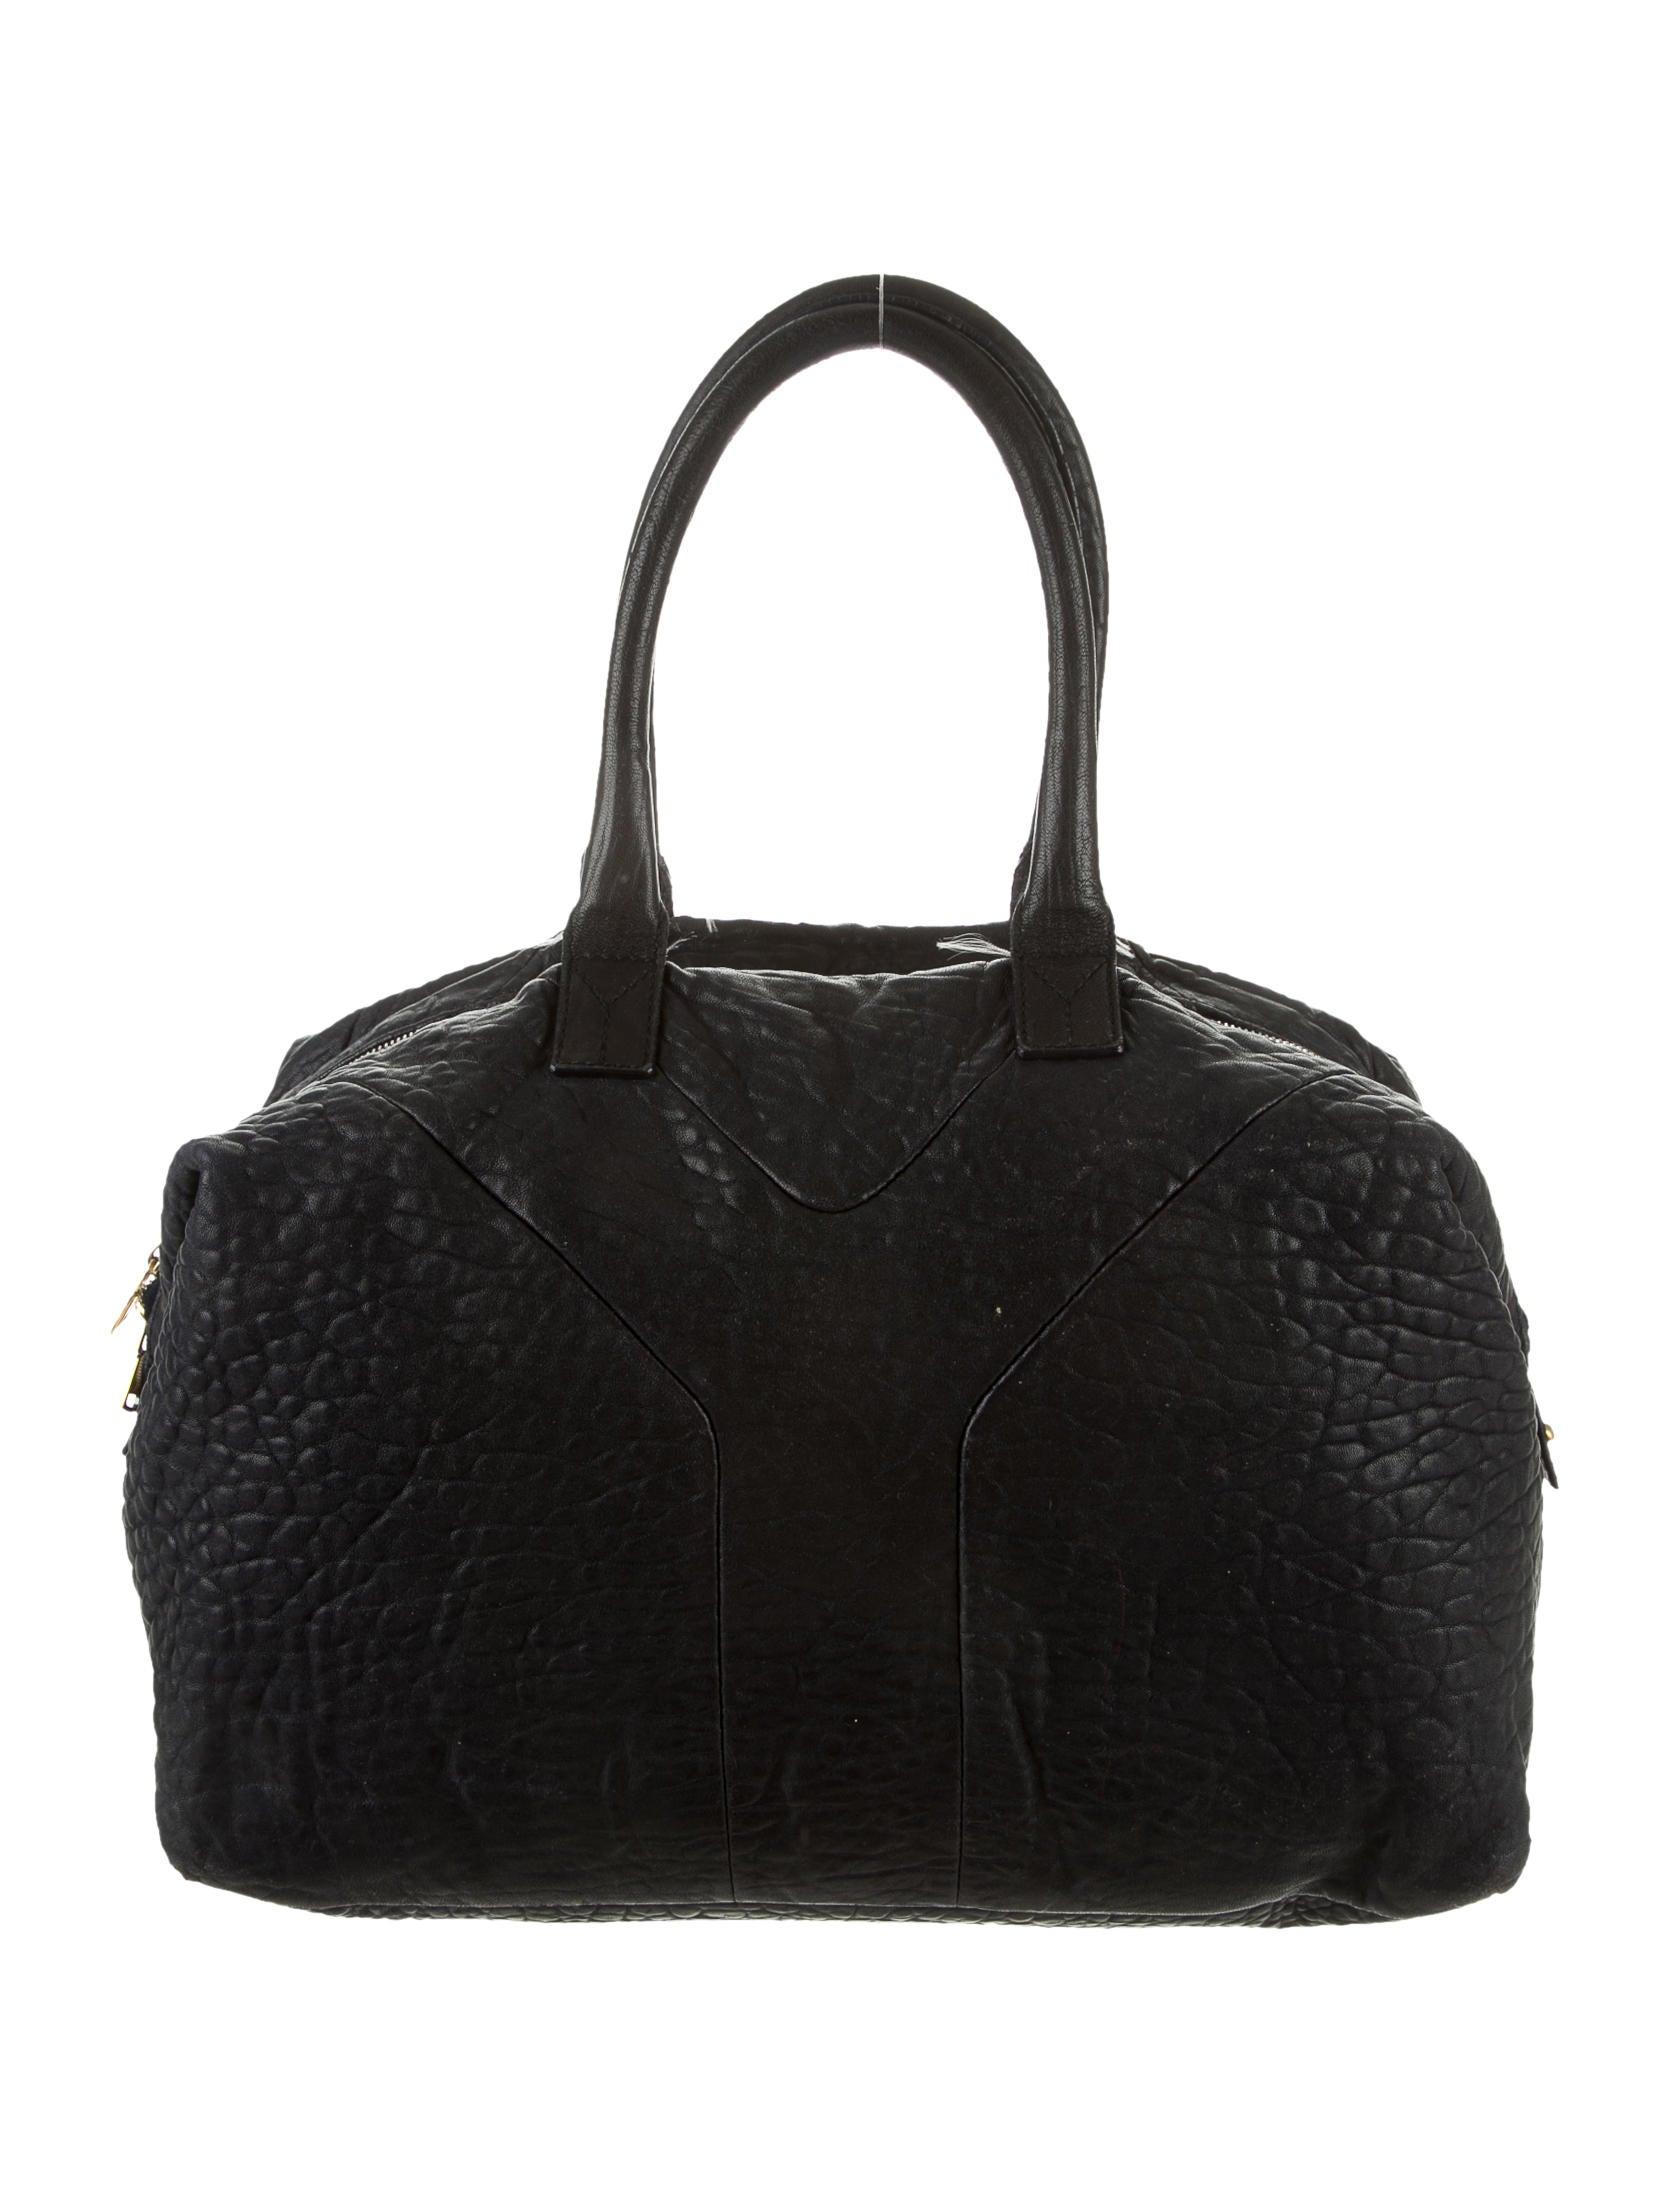 Yves Saint Laurent Easy Bag - Handbags - YVE37180 | The RealReal